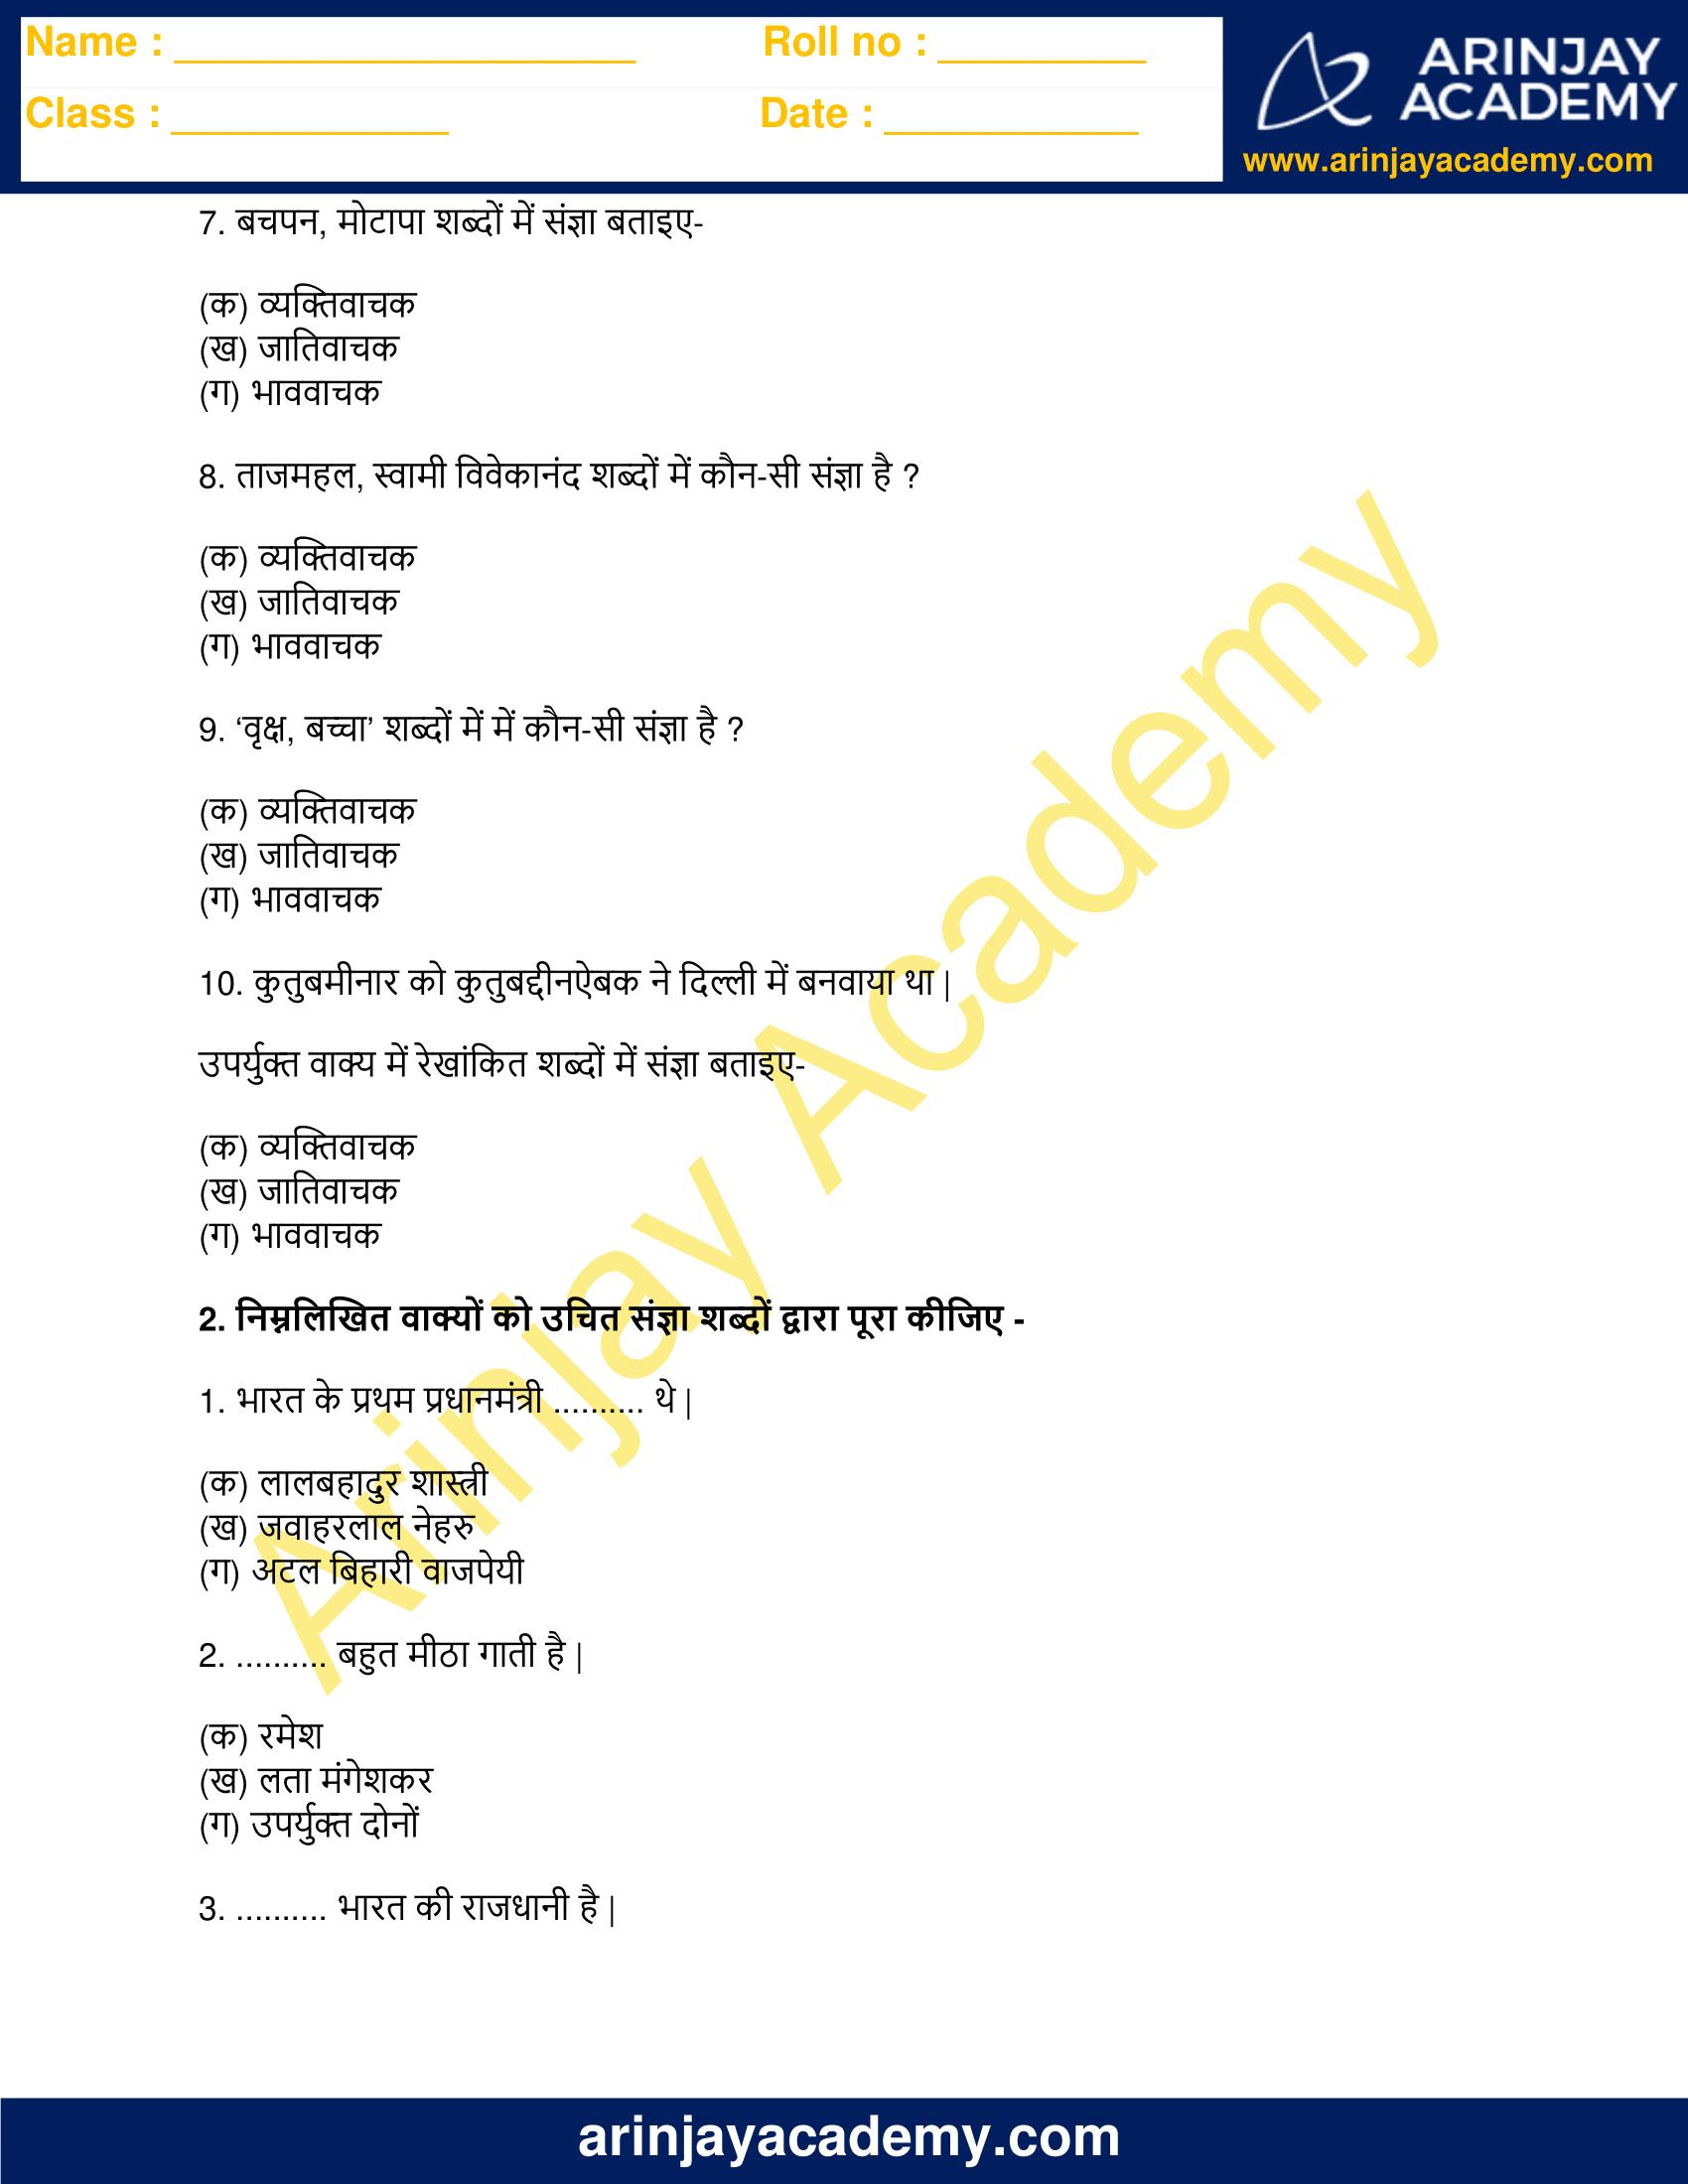 Sangya Worksheet for Class 3 image 2